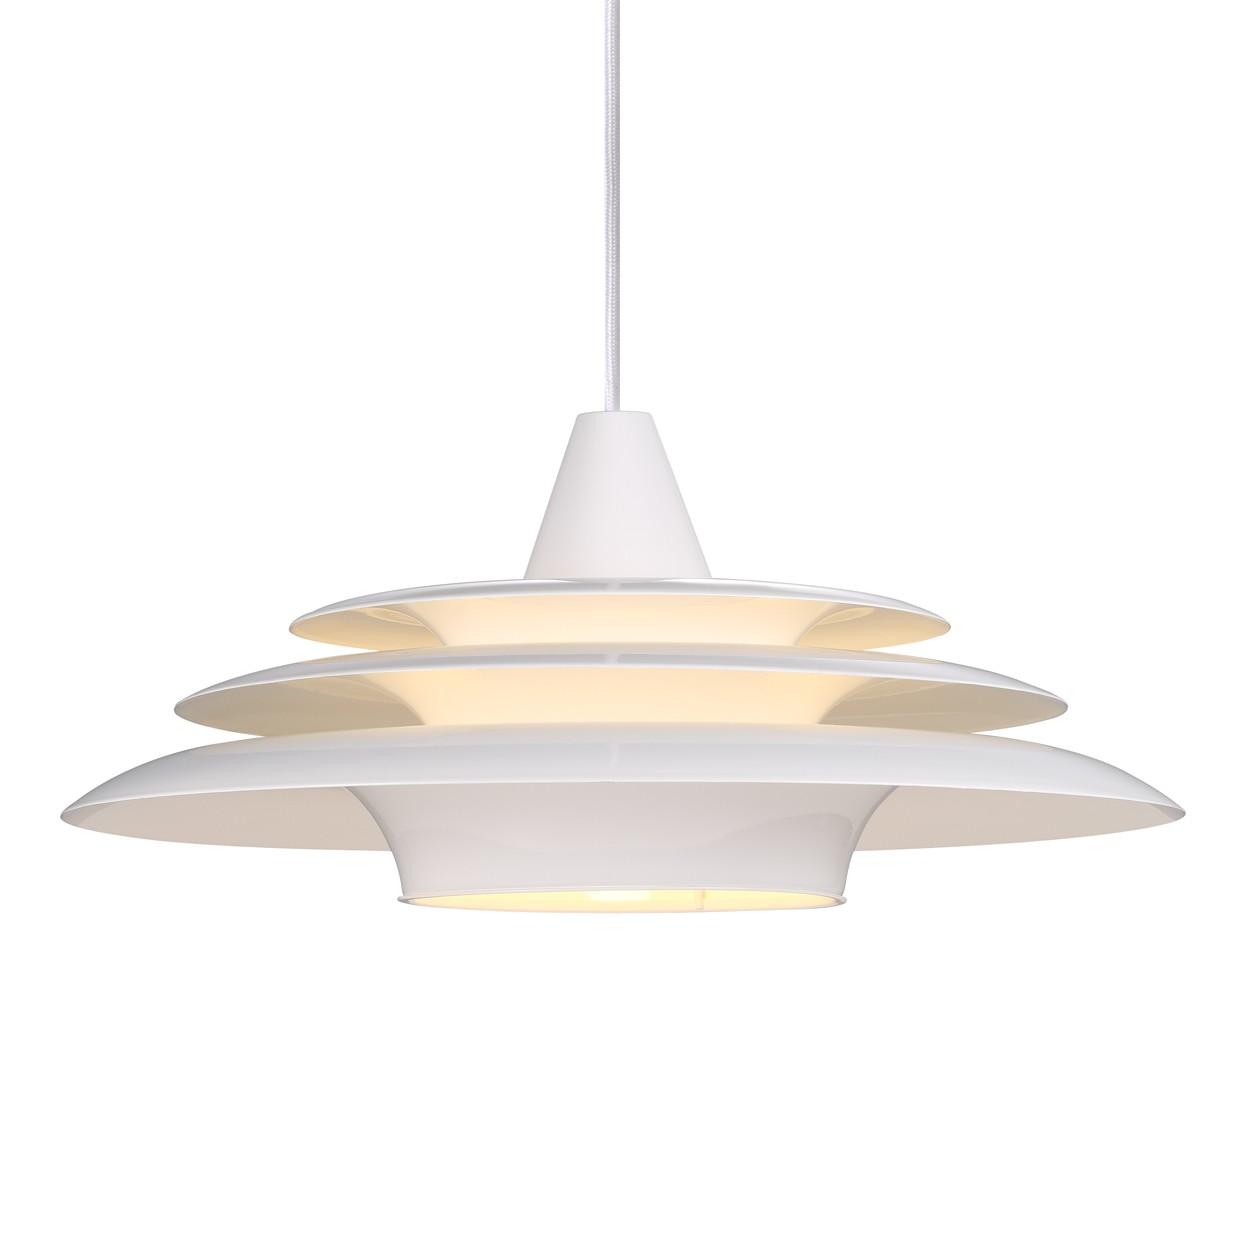 energie  A++, Hanglamp Saturn - wit metaal 1 lichtbroln, Nordlux